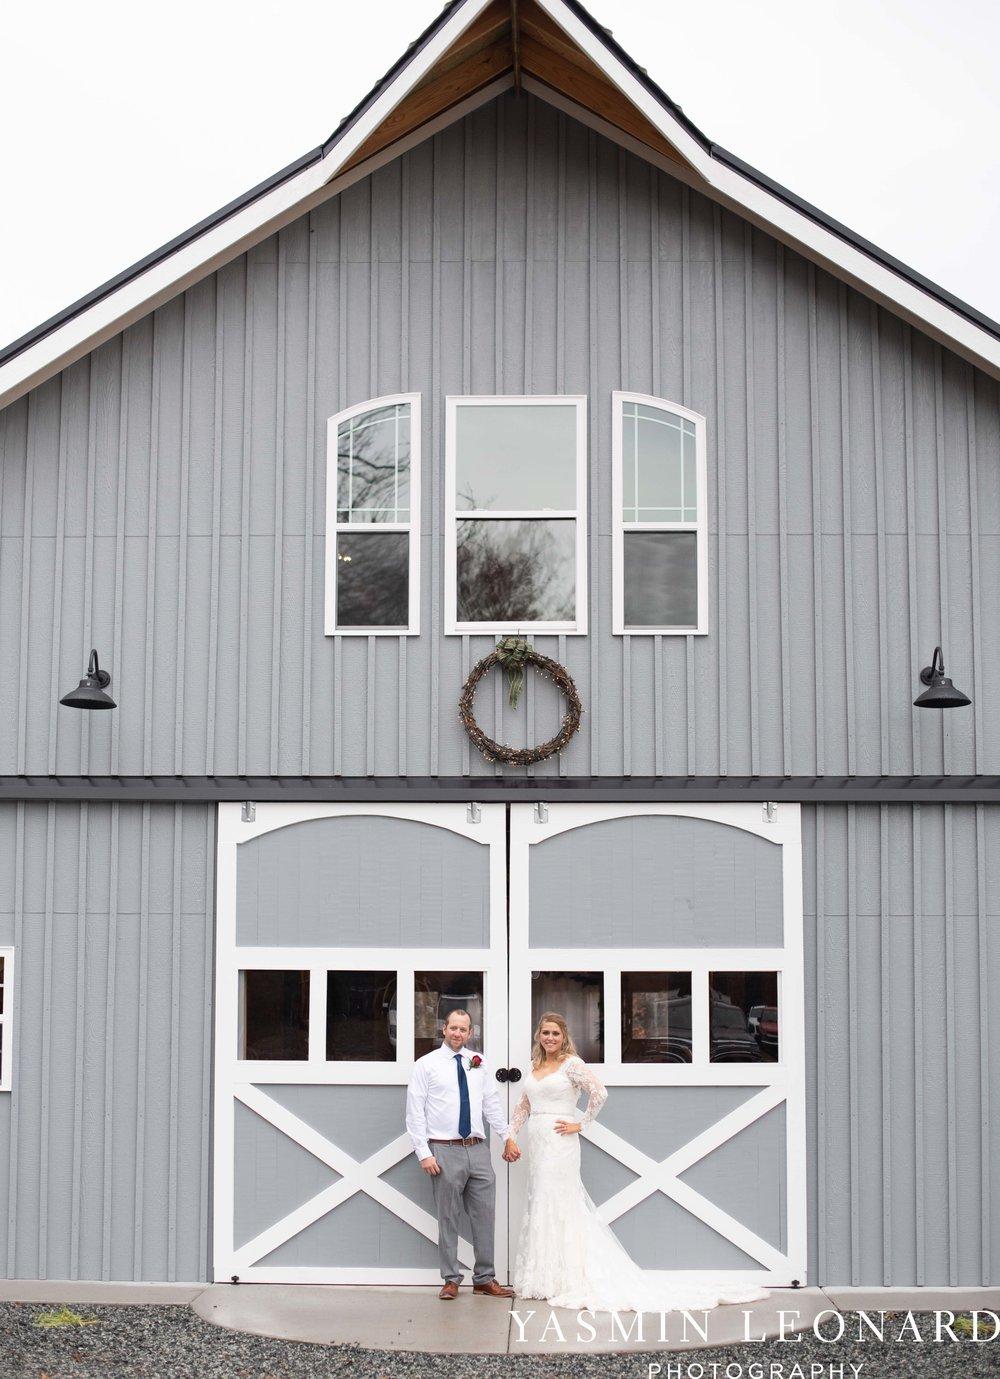 Secret Meadows at Green Dell Farm, NC Barns, NC Wedding Venues, Triad, NC, NC Wedding Photography, Triad Wedding Venues, Affordable Wedding Venues, NEW Wedding Venues, Christmas Weddings-36.jpg